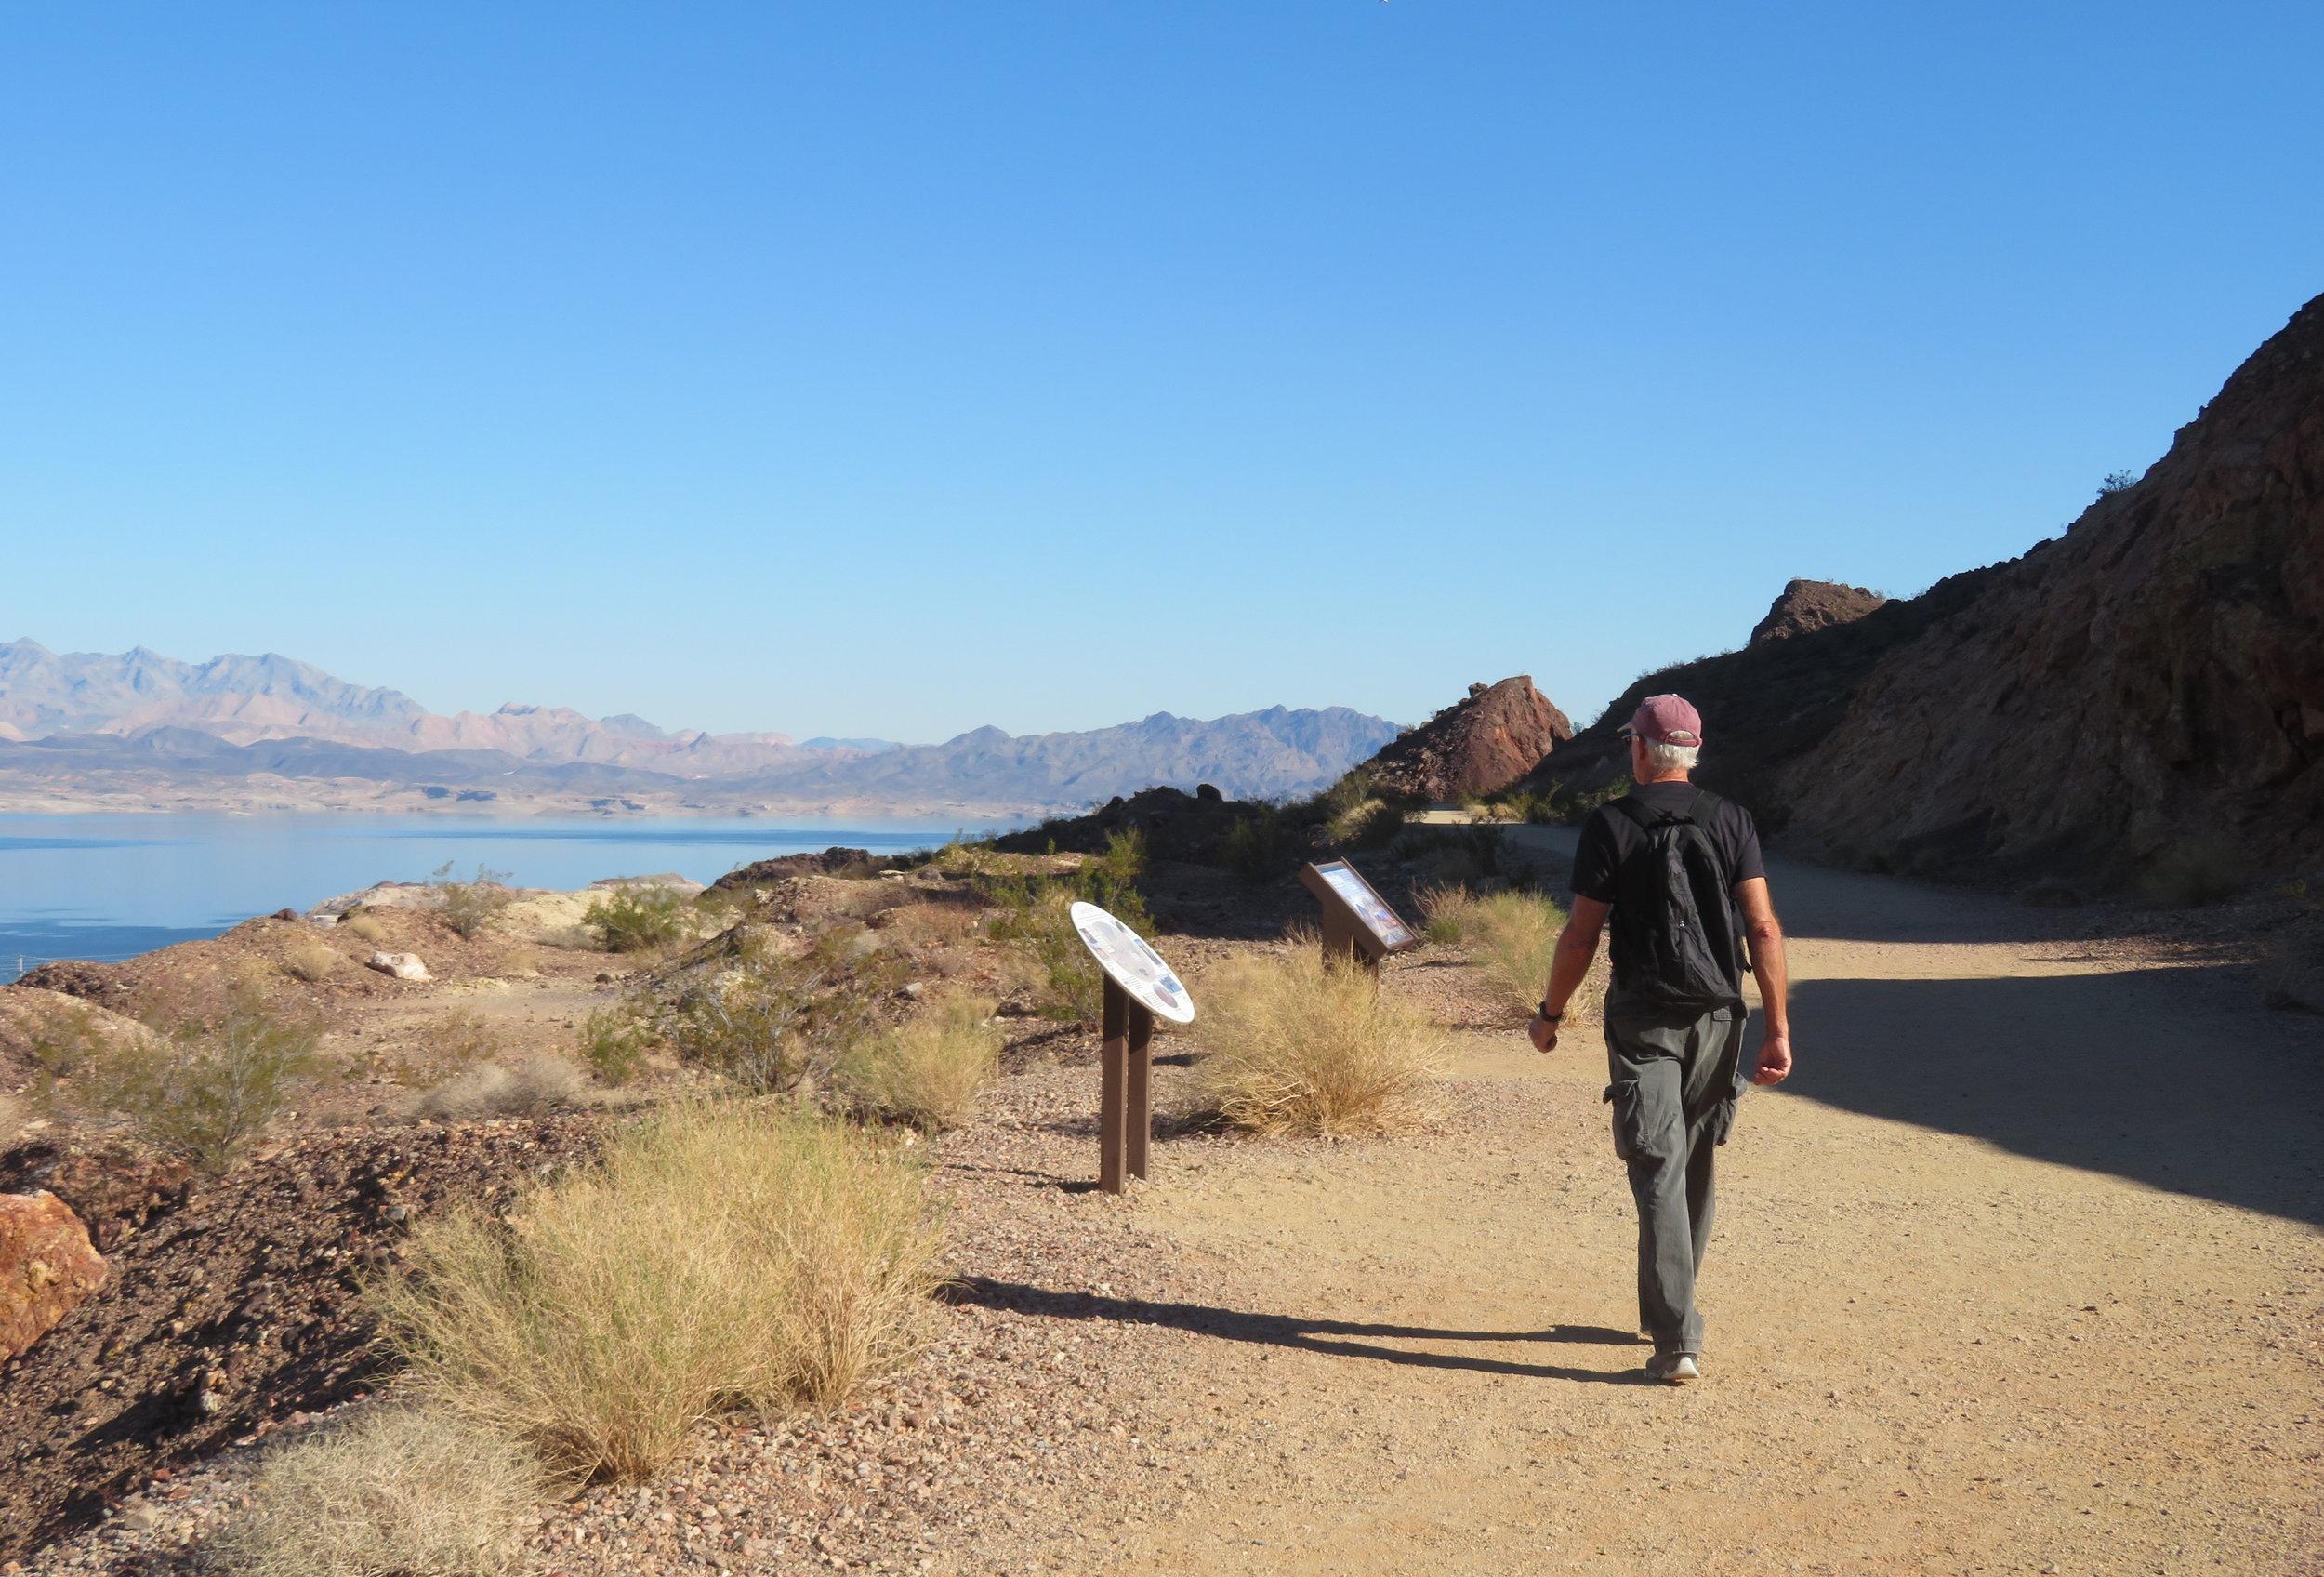 Lake Mead's Historic Railroad Trail